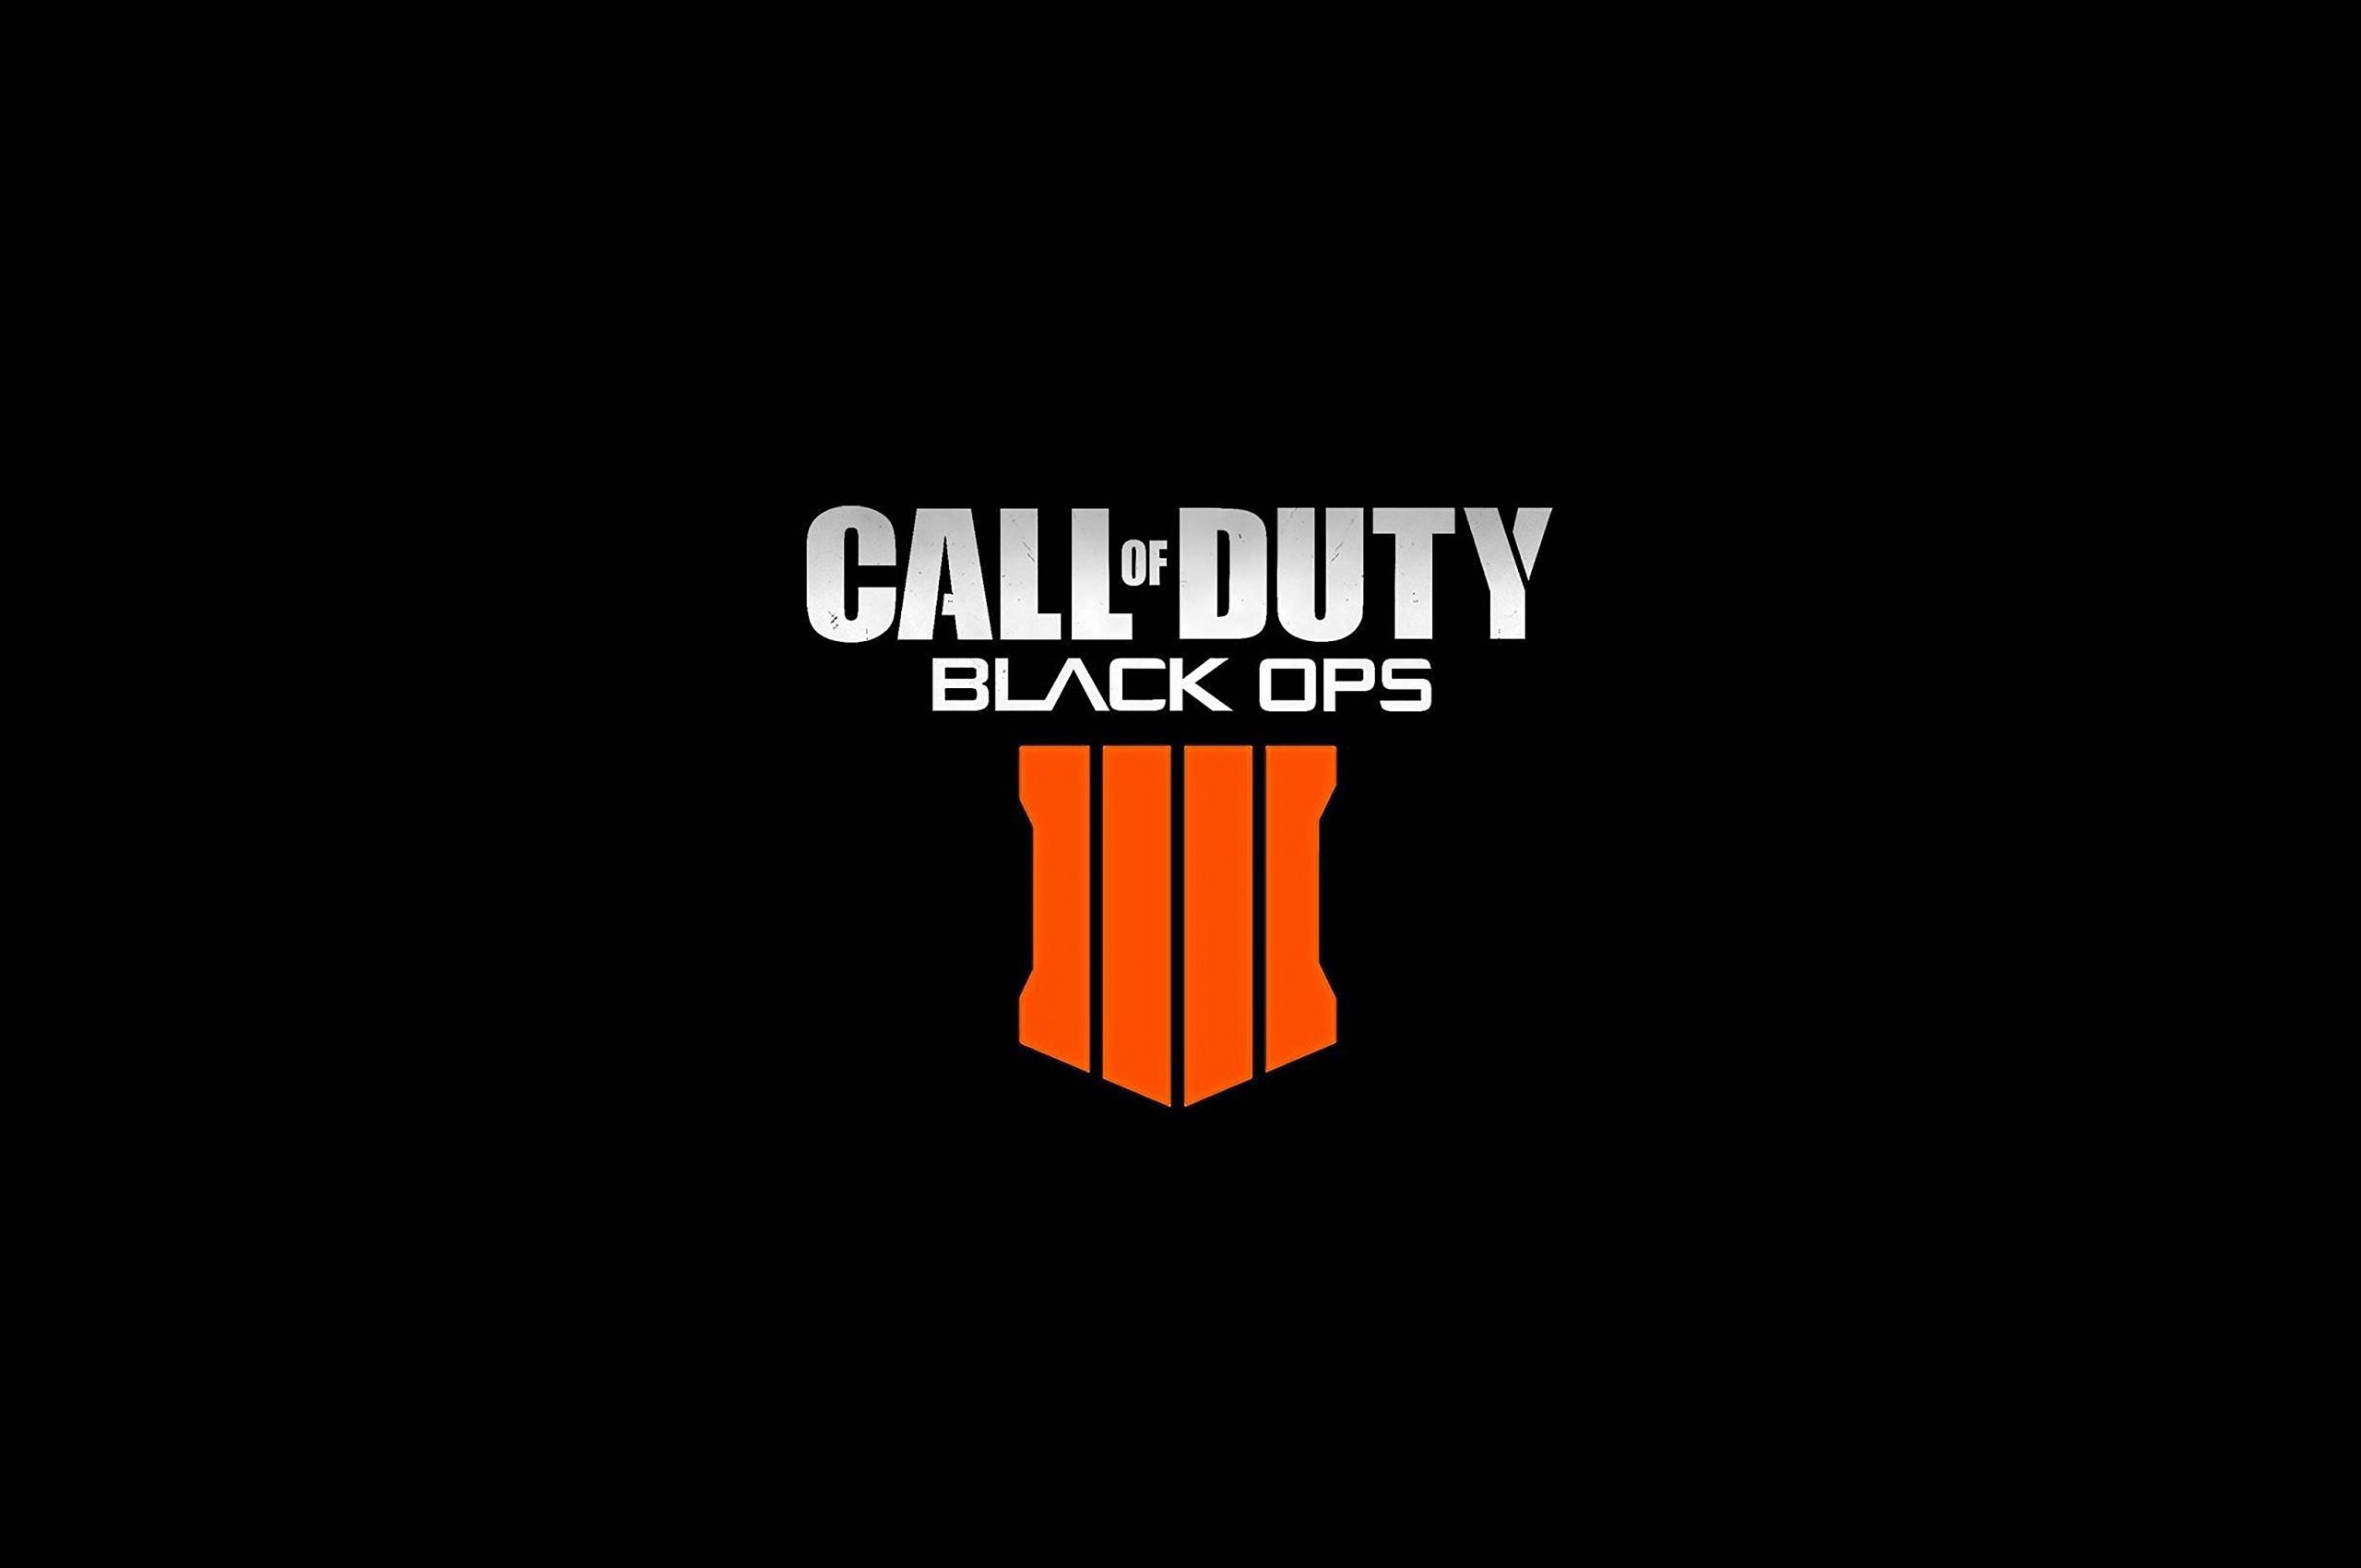 Free Download Call Of Duty Black Ops 4 4k 8k Hd Wallpaper 4